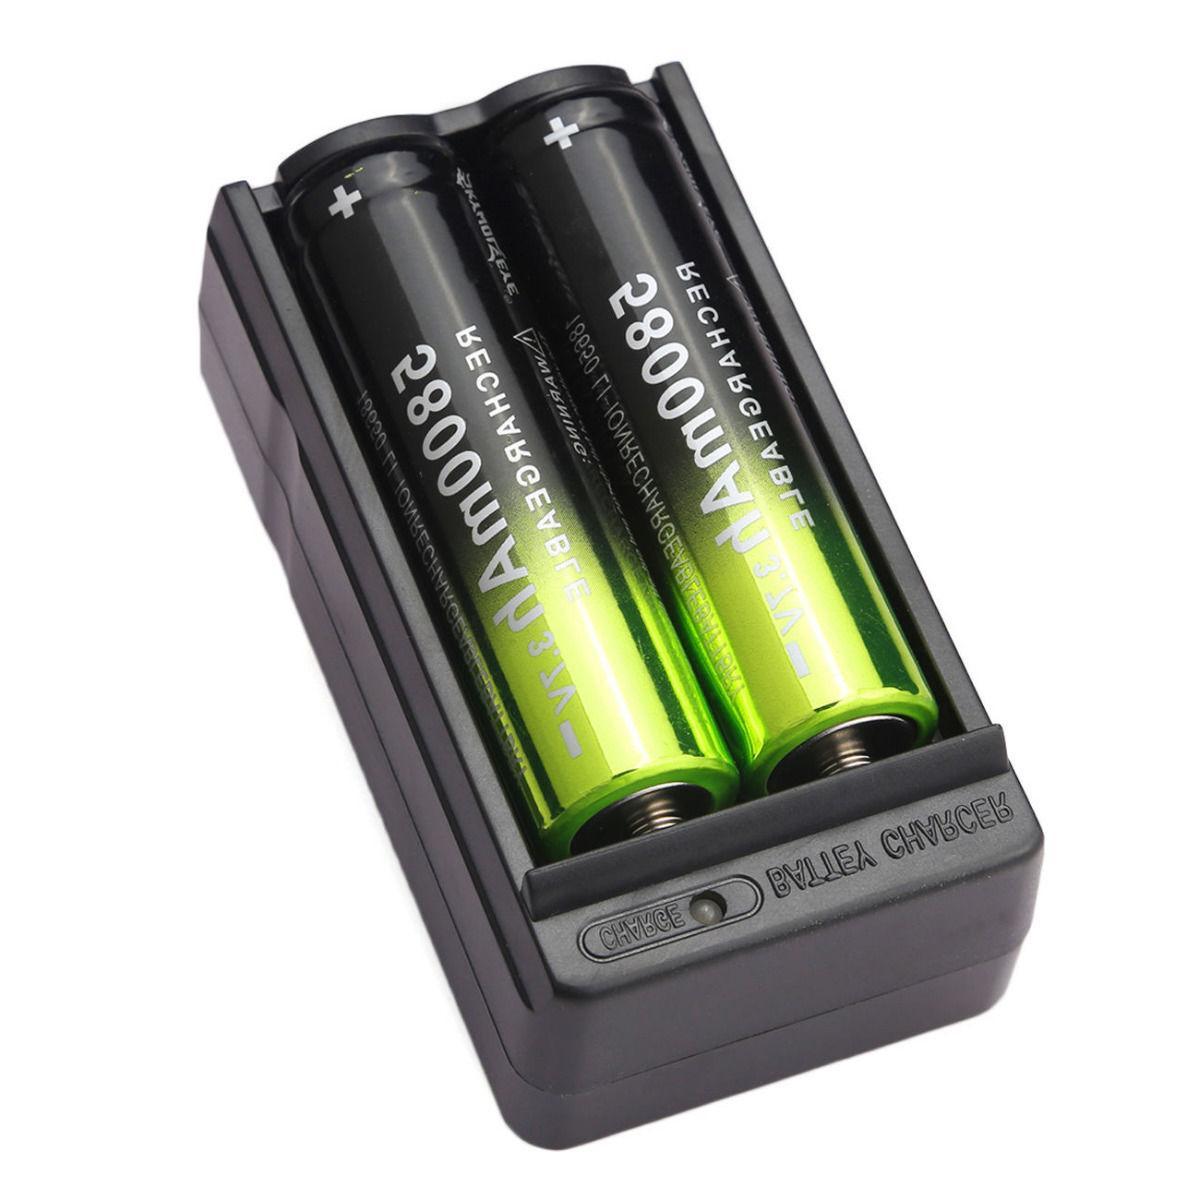 4X Battery 5800mAh 3.7V Charger Flashlight